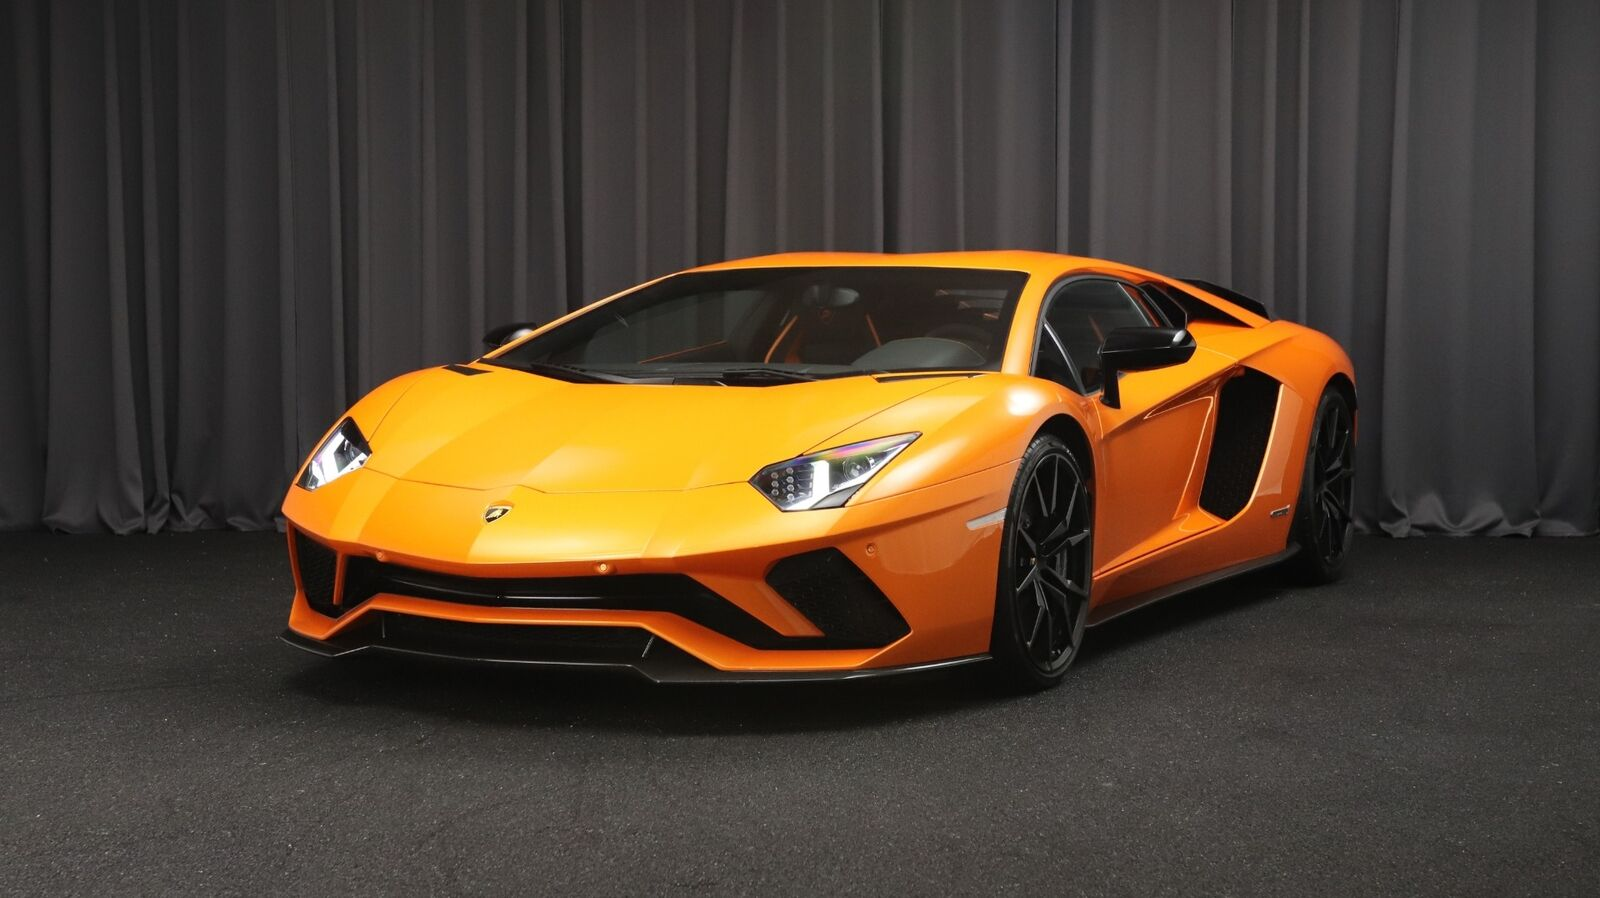 Lamborghini Aventador 6,5 S 2d